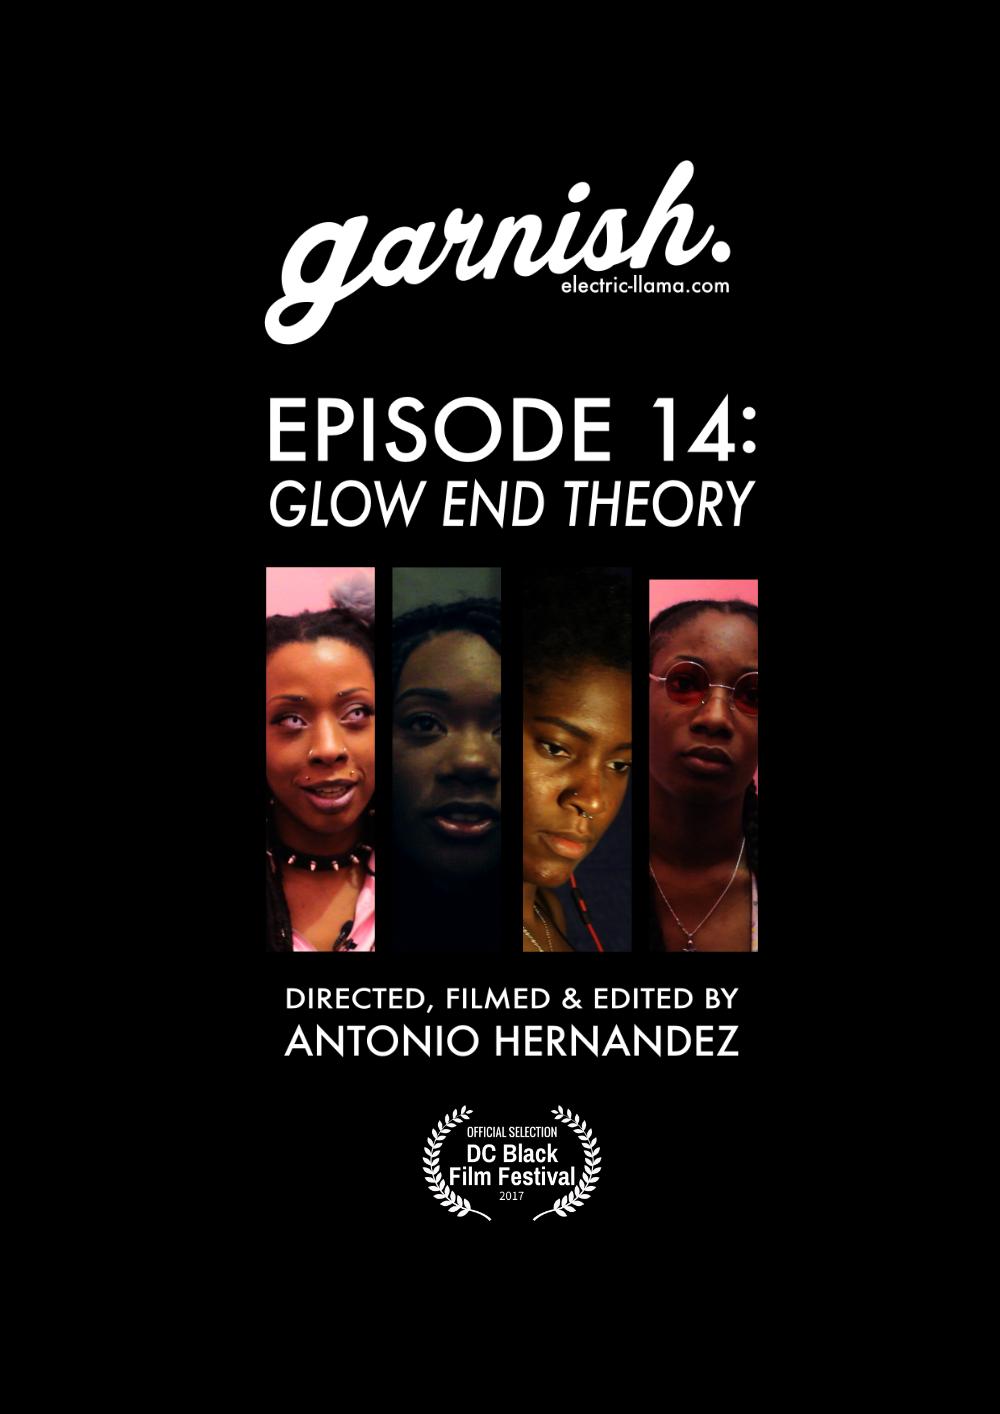 Electric Llama - garnish_ep14_poster.png